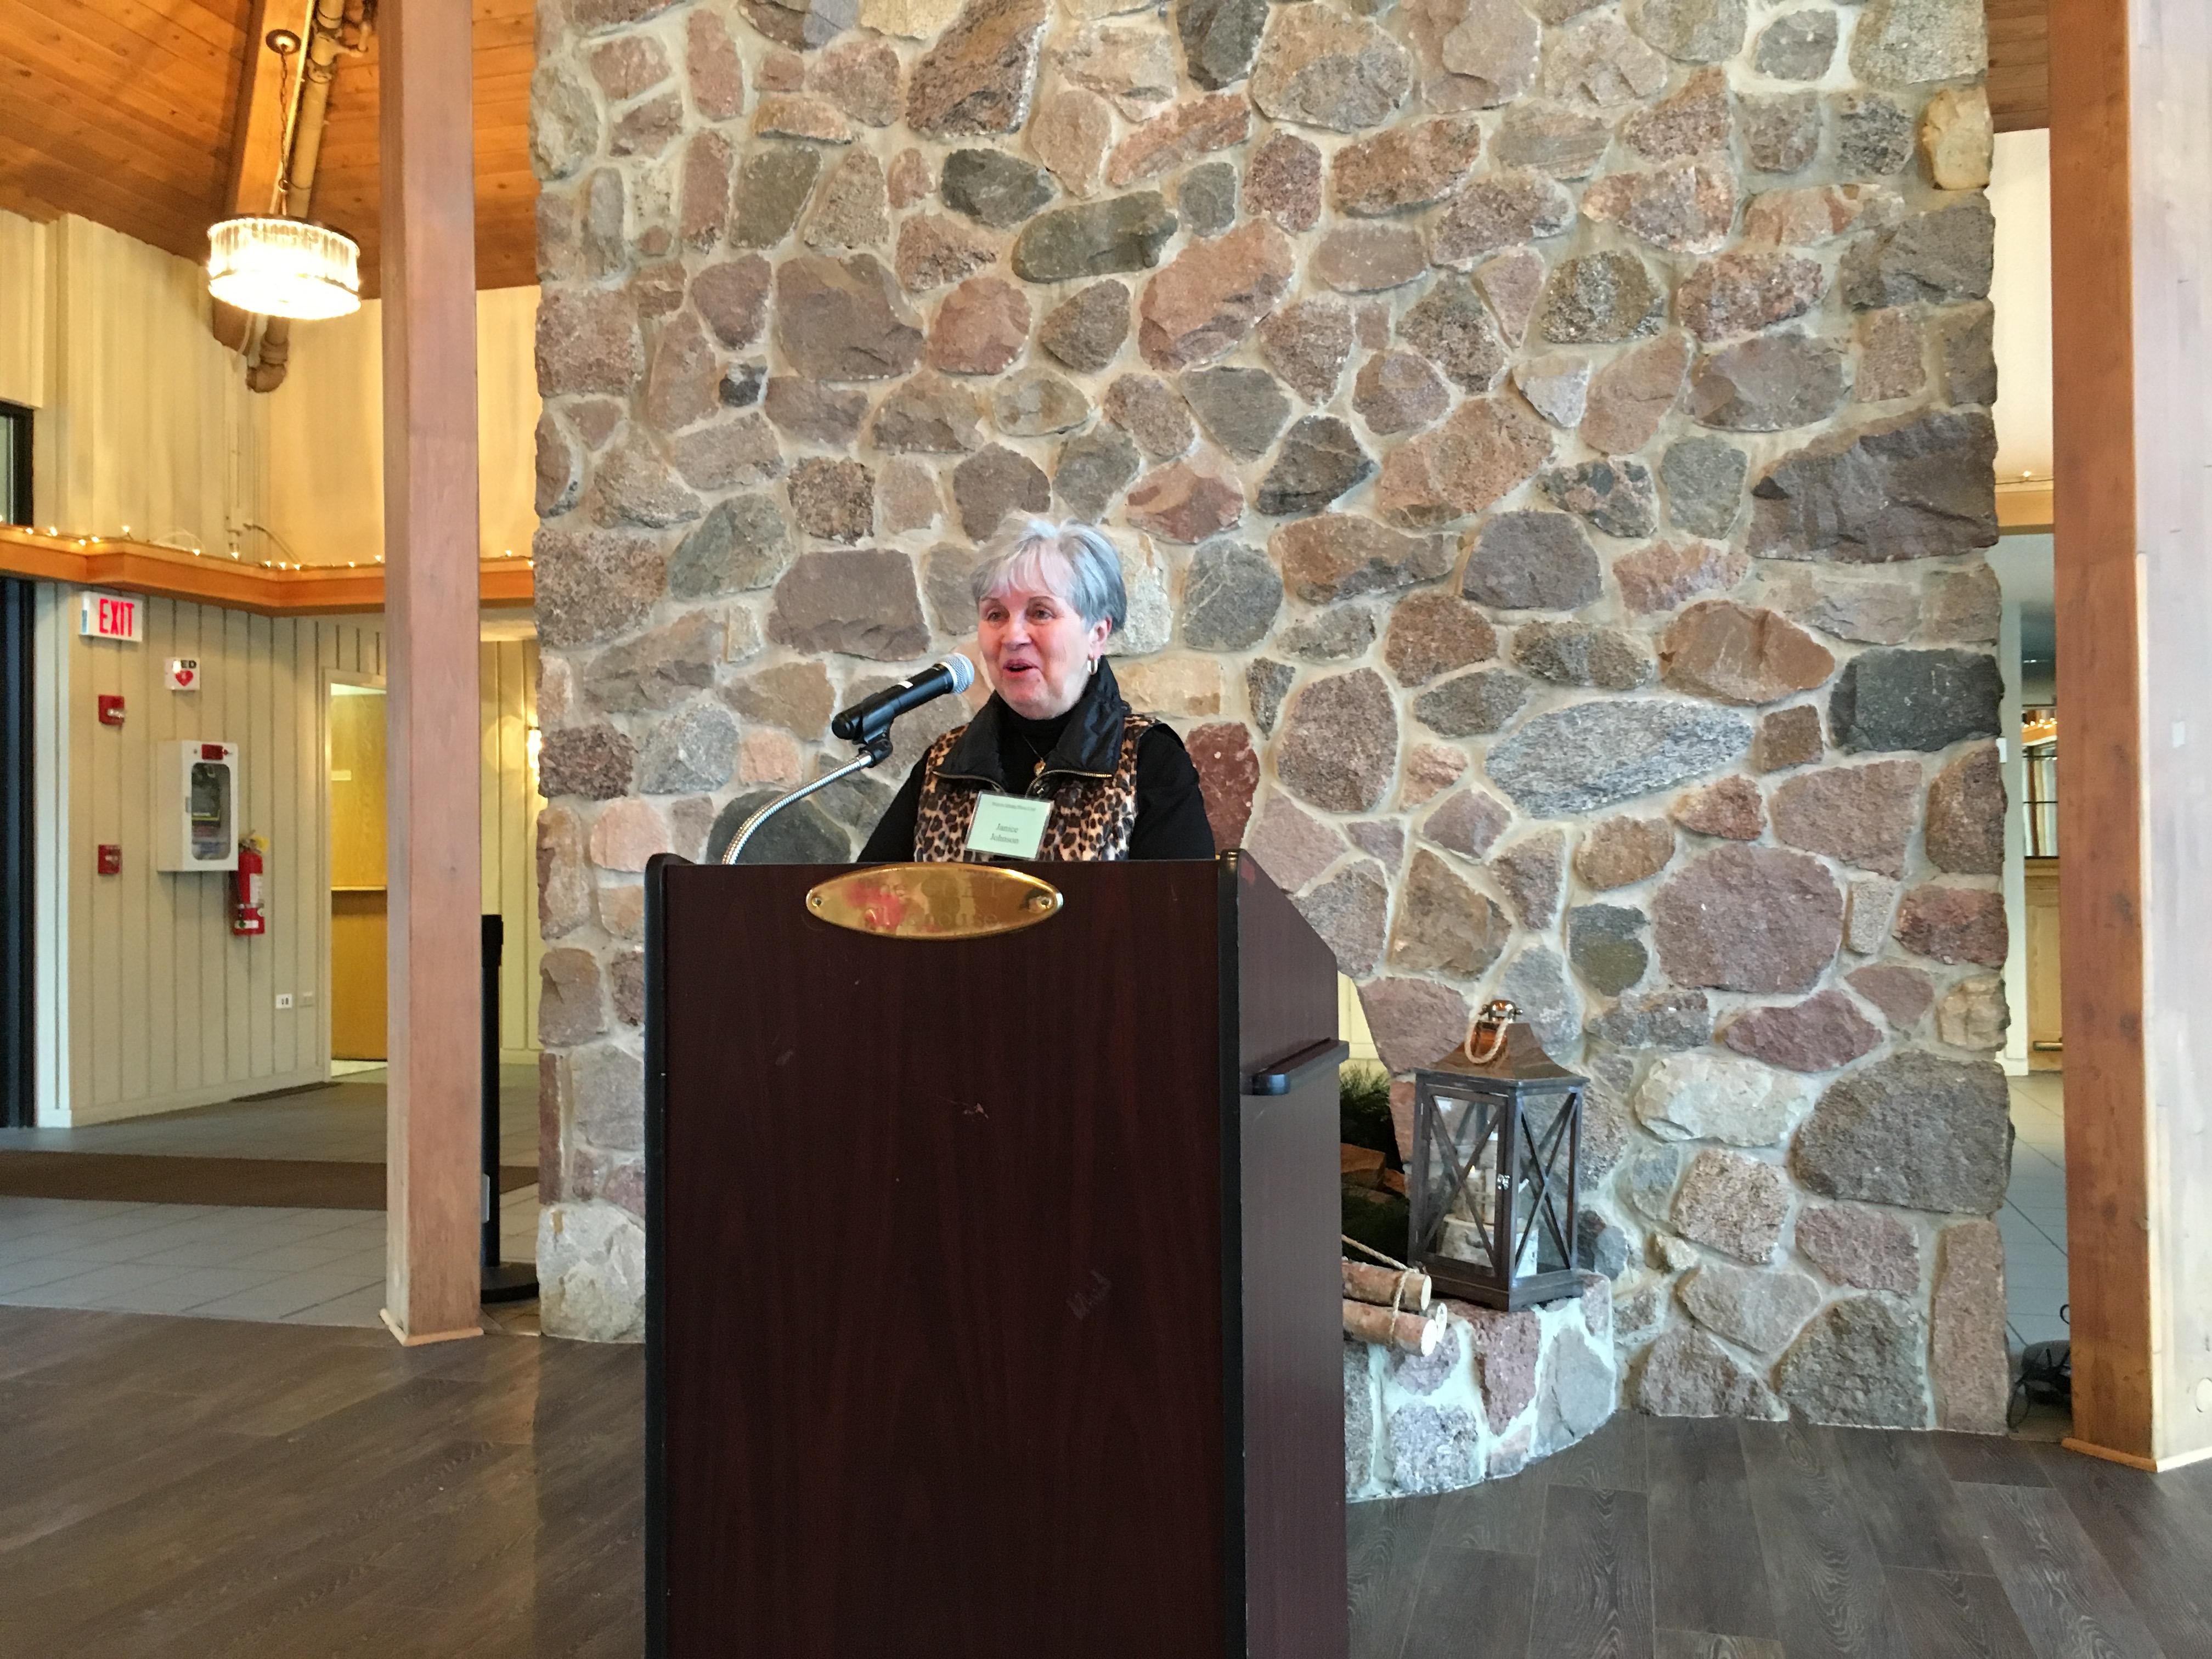 Janice Johnson, Jan. 2018 Meeting